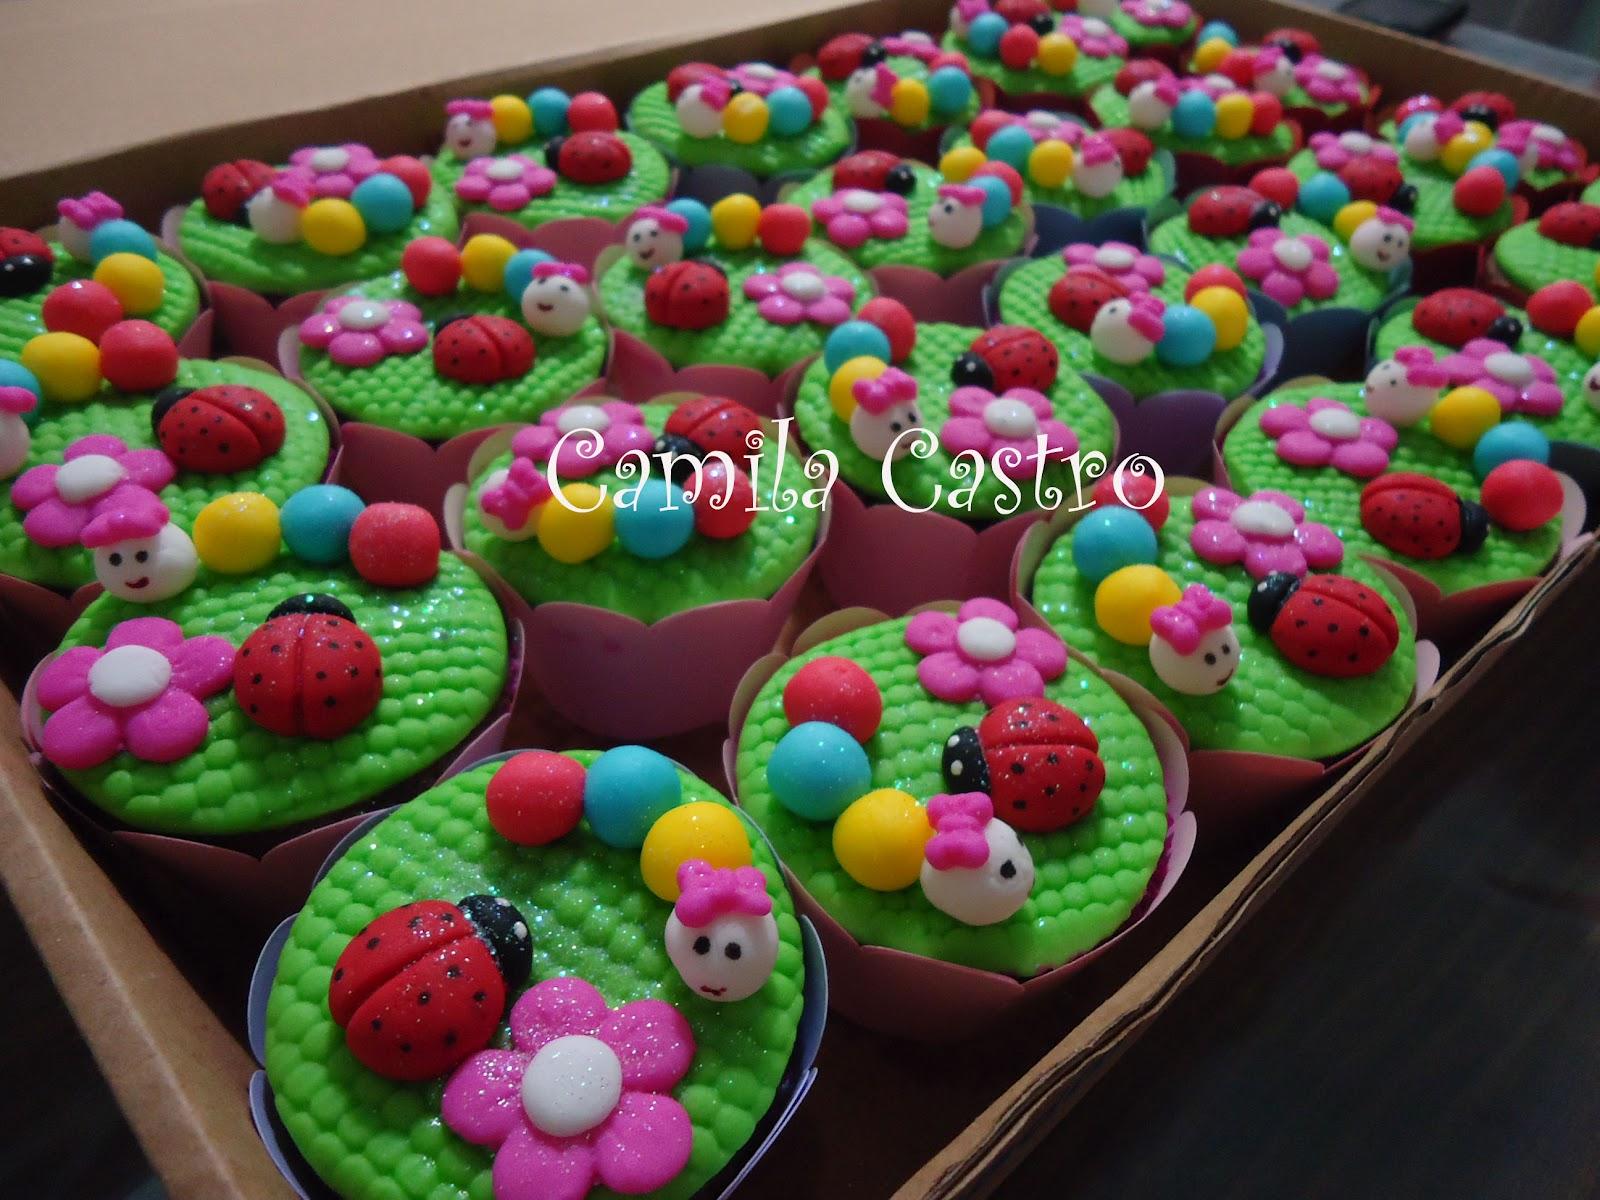 decoracao de bolo tema jardim encantado : decoracao de bolo tema jardim encantado:Camila Castro Bolos Decorados: Cupcakes Jardim Encantado